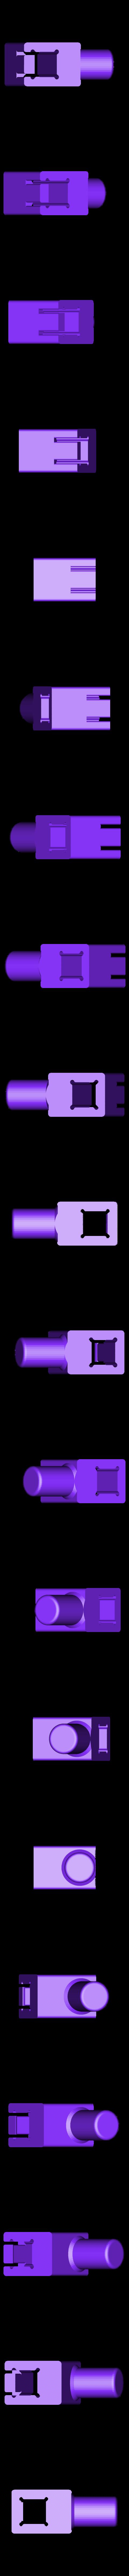 Interior_slide.stl Download STL file Armillary phone Holder • Design to 3D print, 3d-fabric-jean-pierre